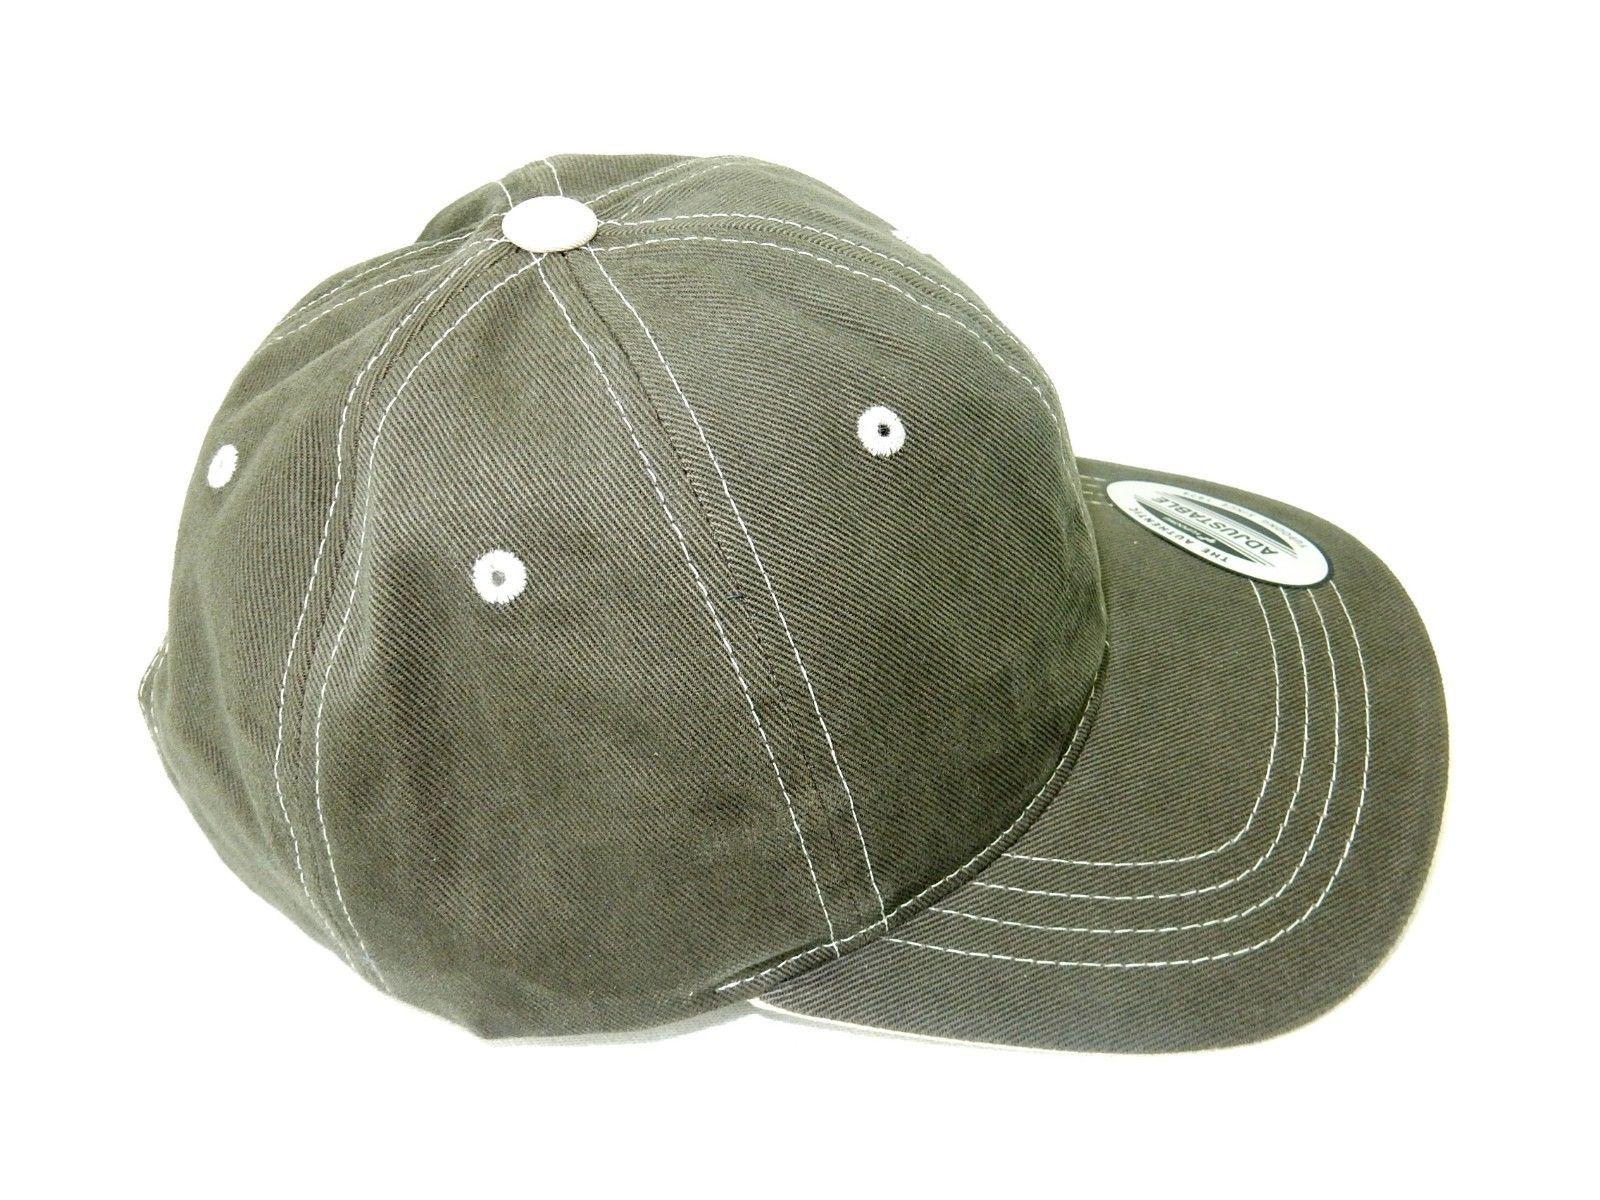 Baseball Cap, 6-Panel FlexFit w/Adjustable Headband, Cotton, Stone/Grey, #6161